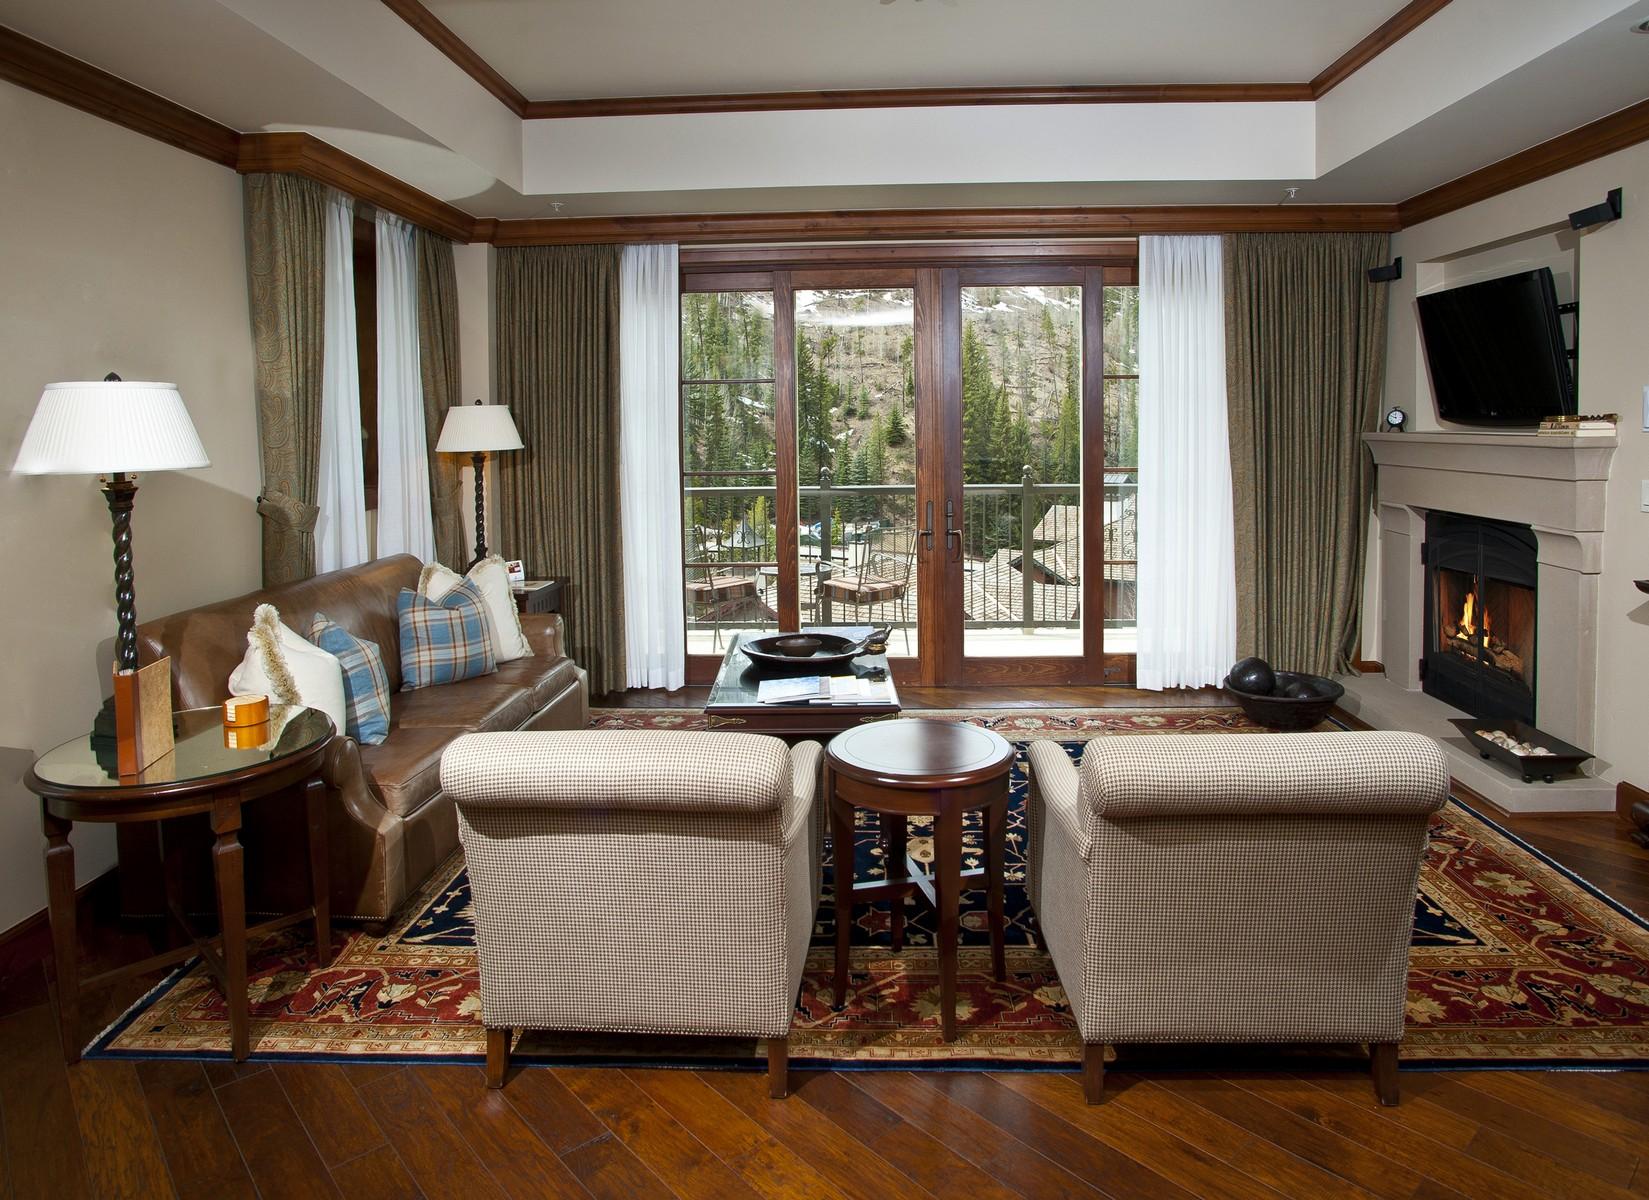 Propriedades individuais para Venda às The Ritz-Carlton Club, Vail 728 West Lionshead Cir #428-23 Vail, Colorado, 81657 Estados Unidos